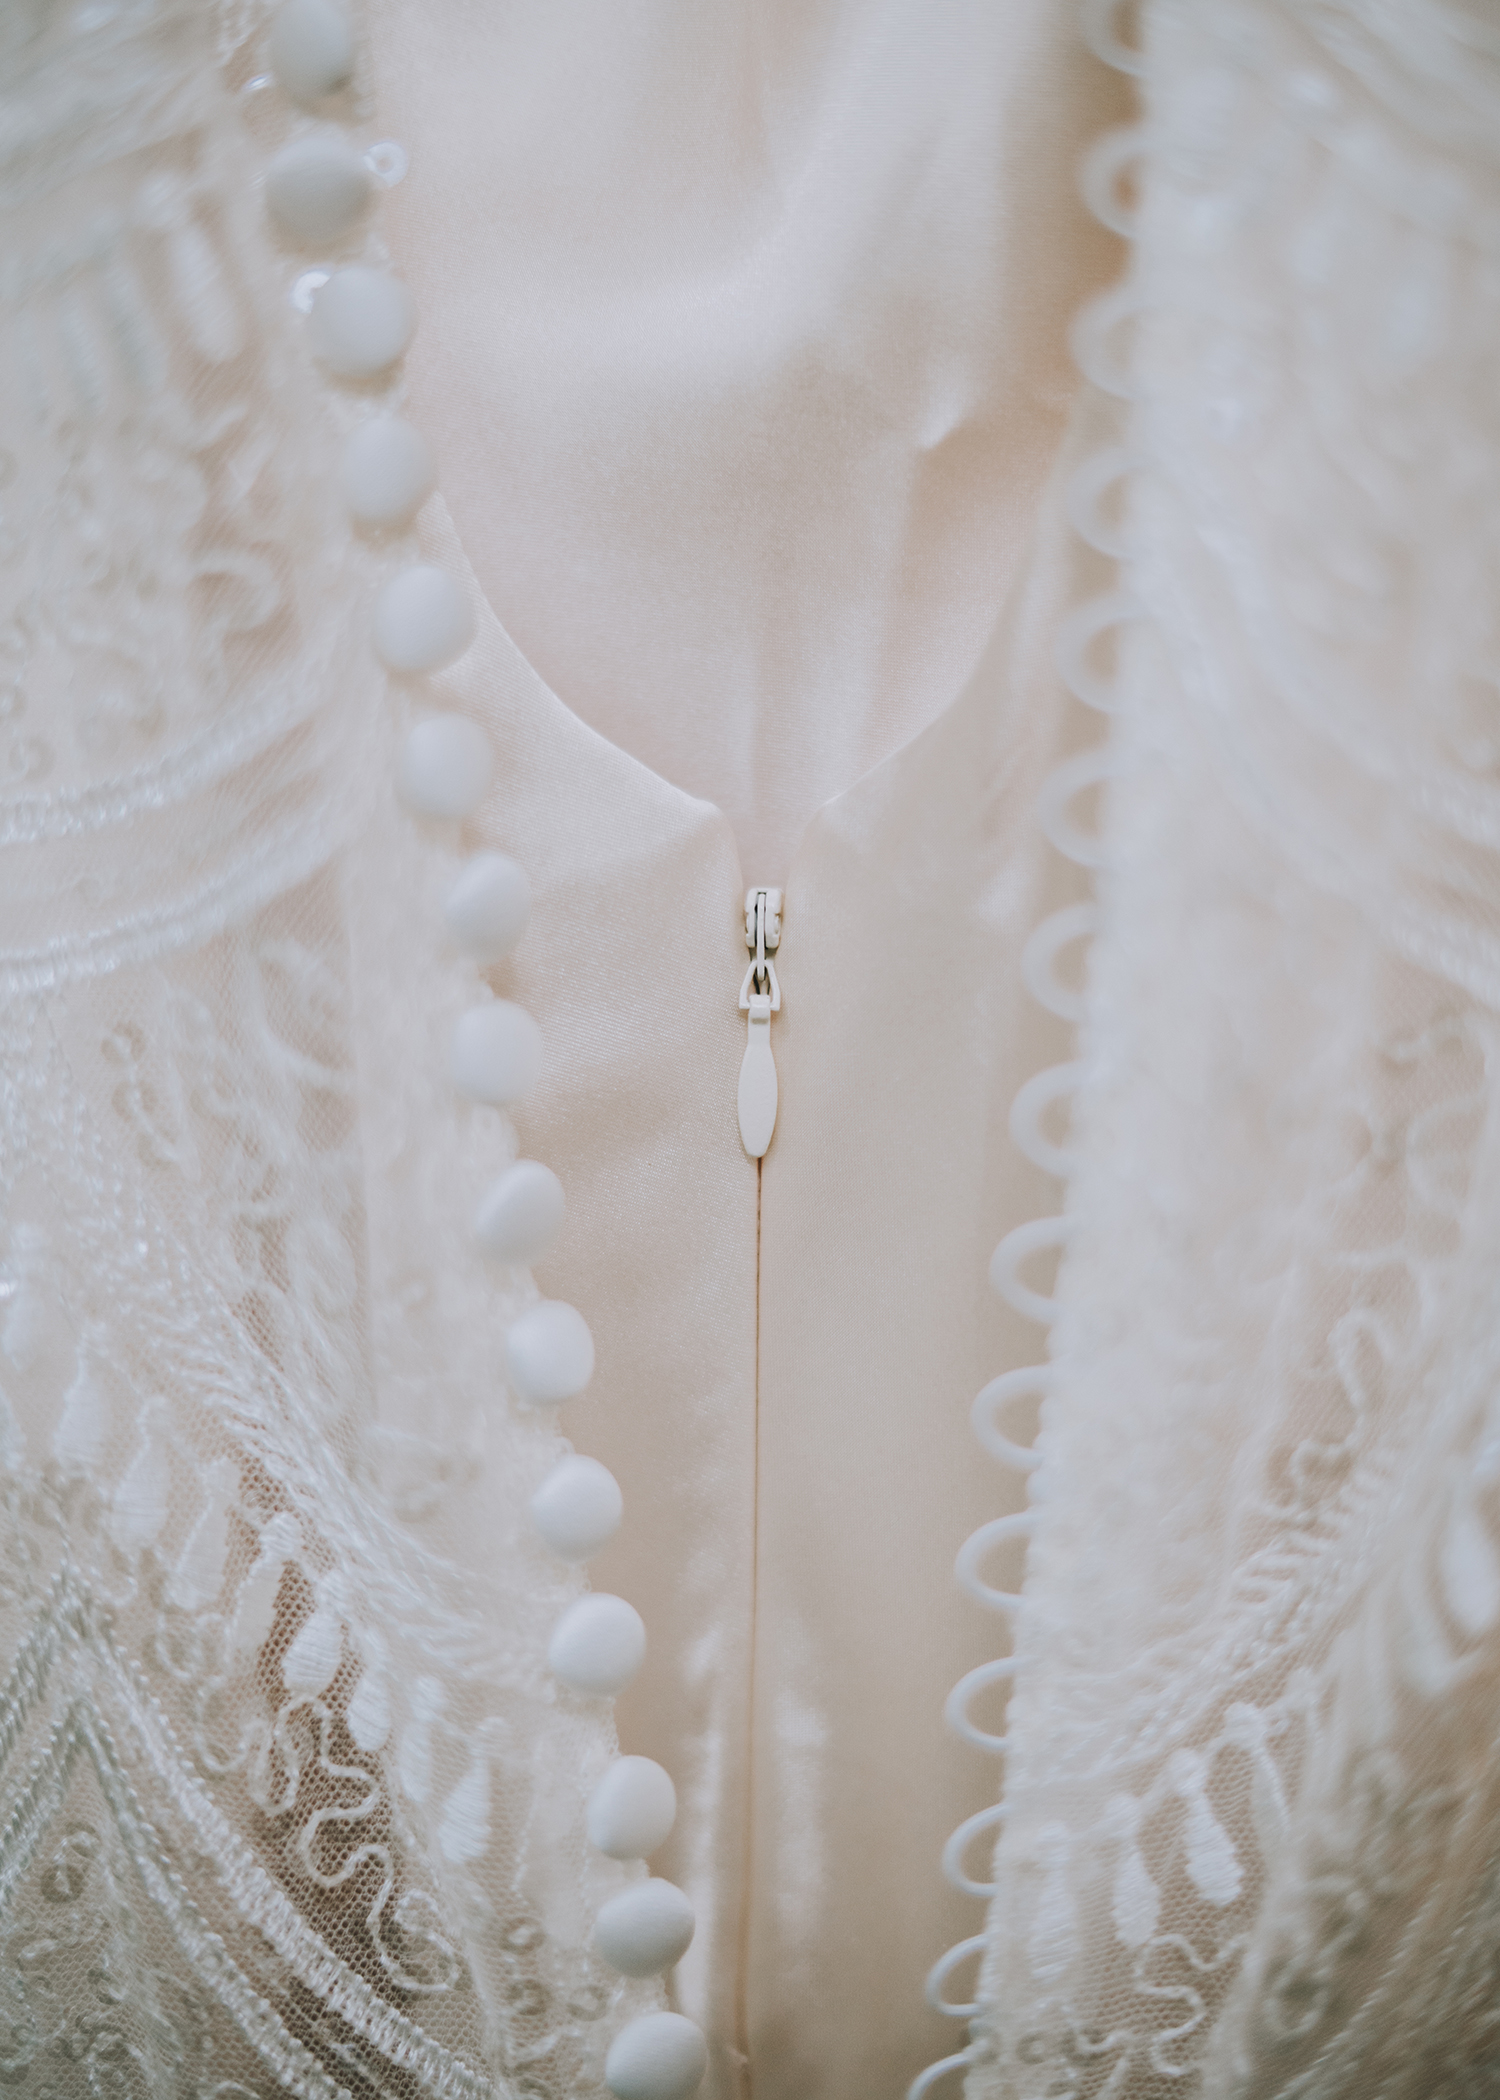 Wedding photographer Indianapolis Hannah Bergman Photography wedding dress